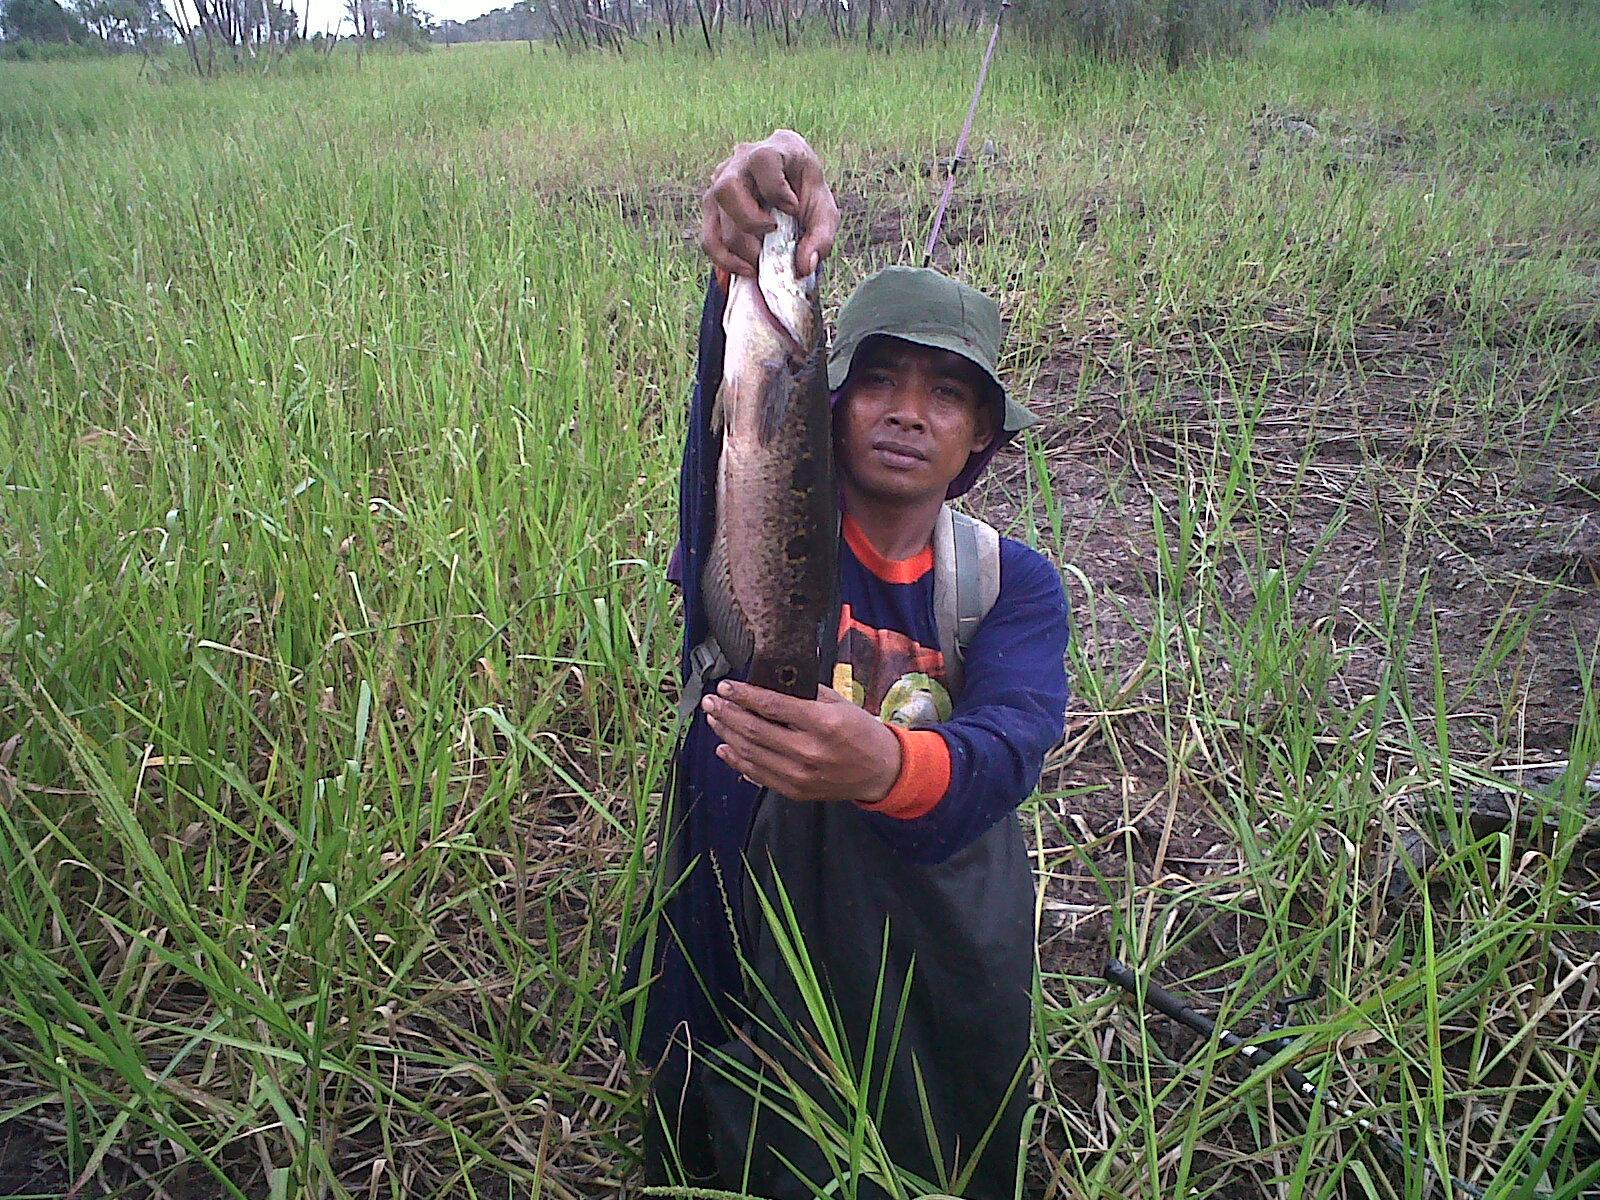 Menangkap Ikan Besar Menangkap Ikan Toman Yang